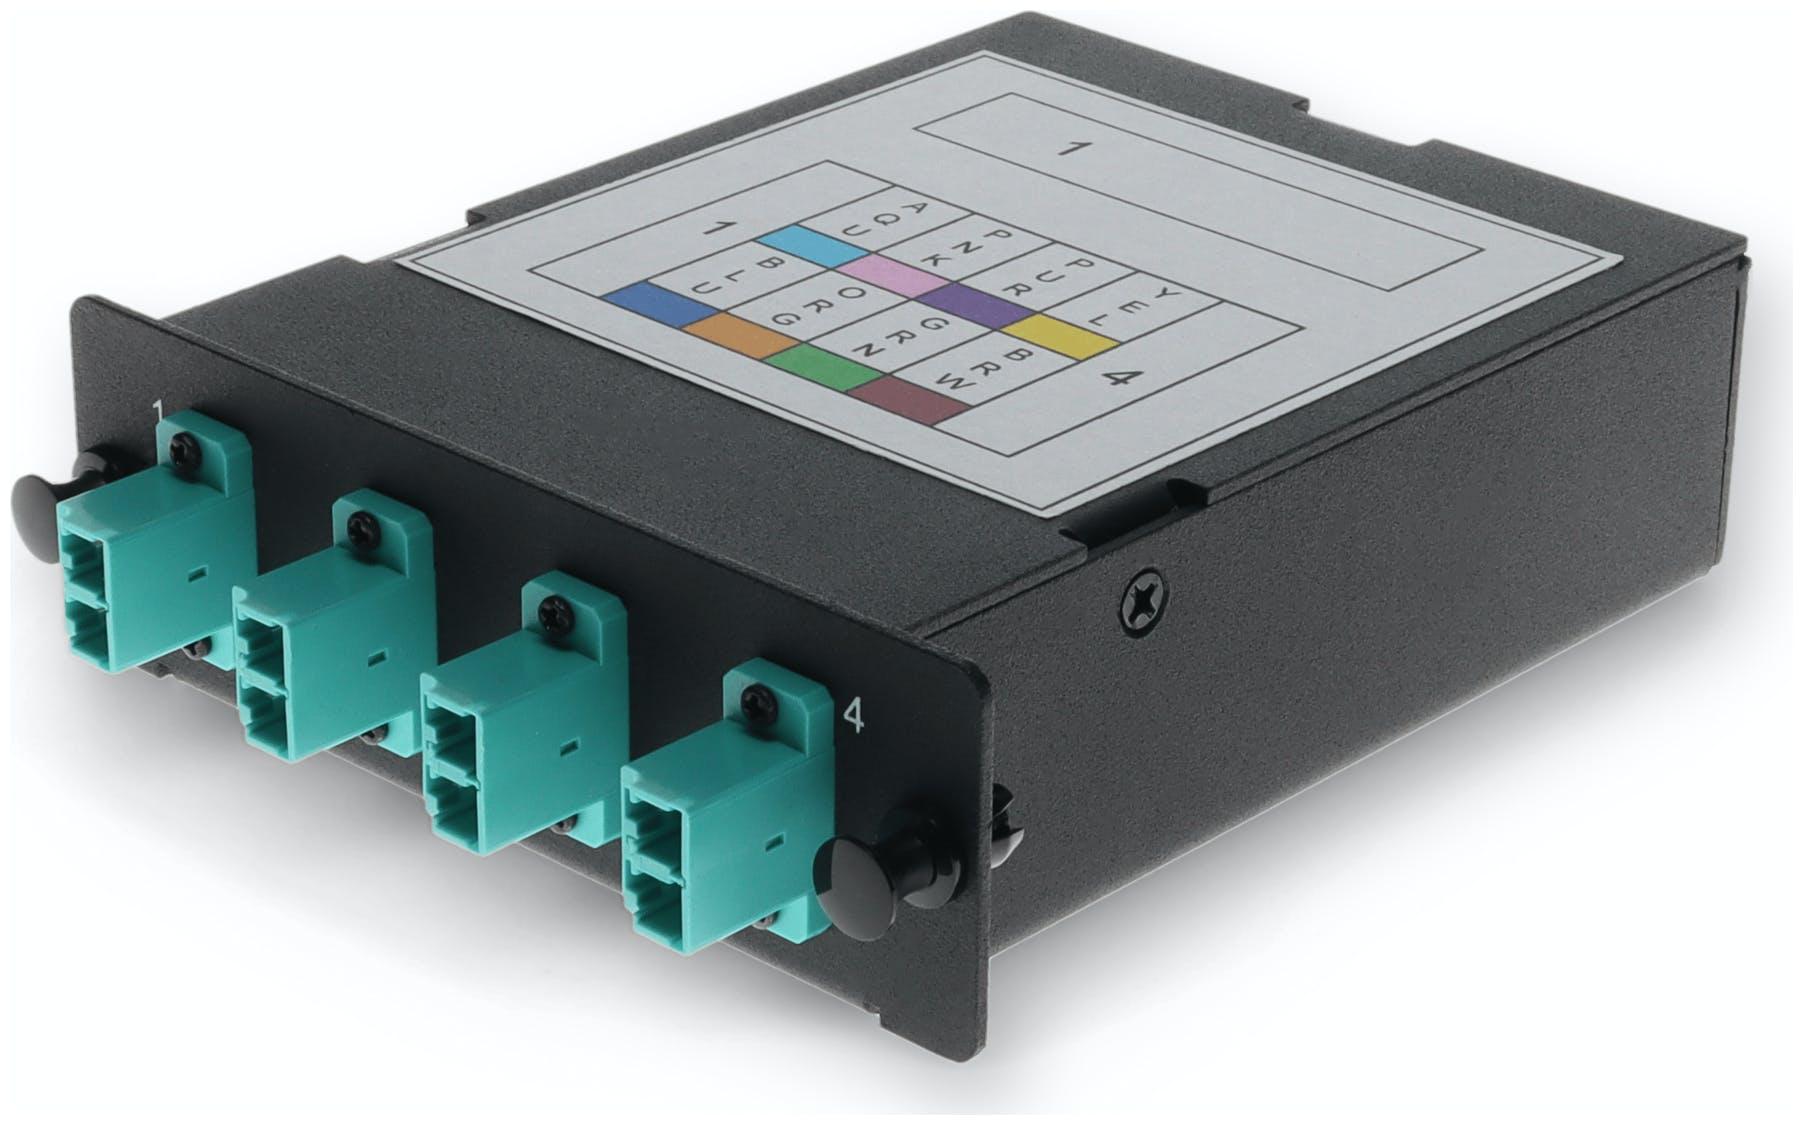 40G/100G Bidi Transceiver Alternative